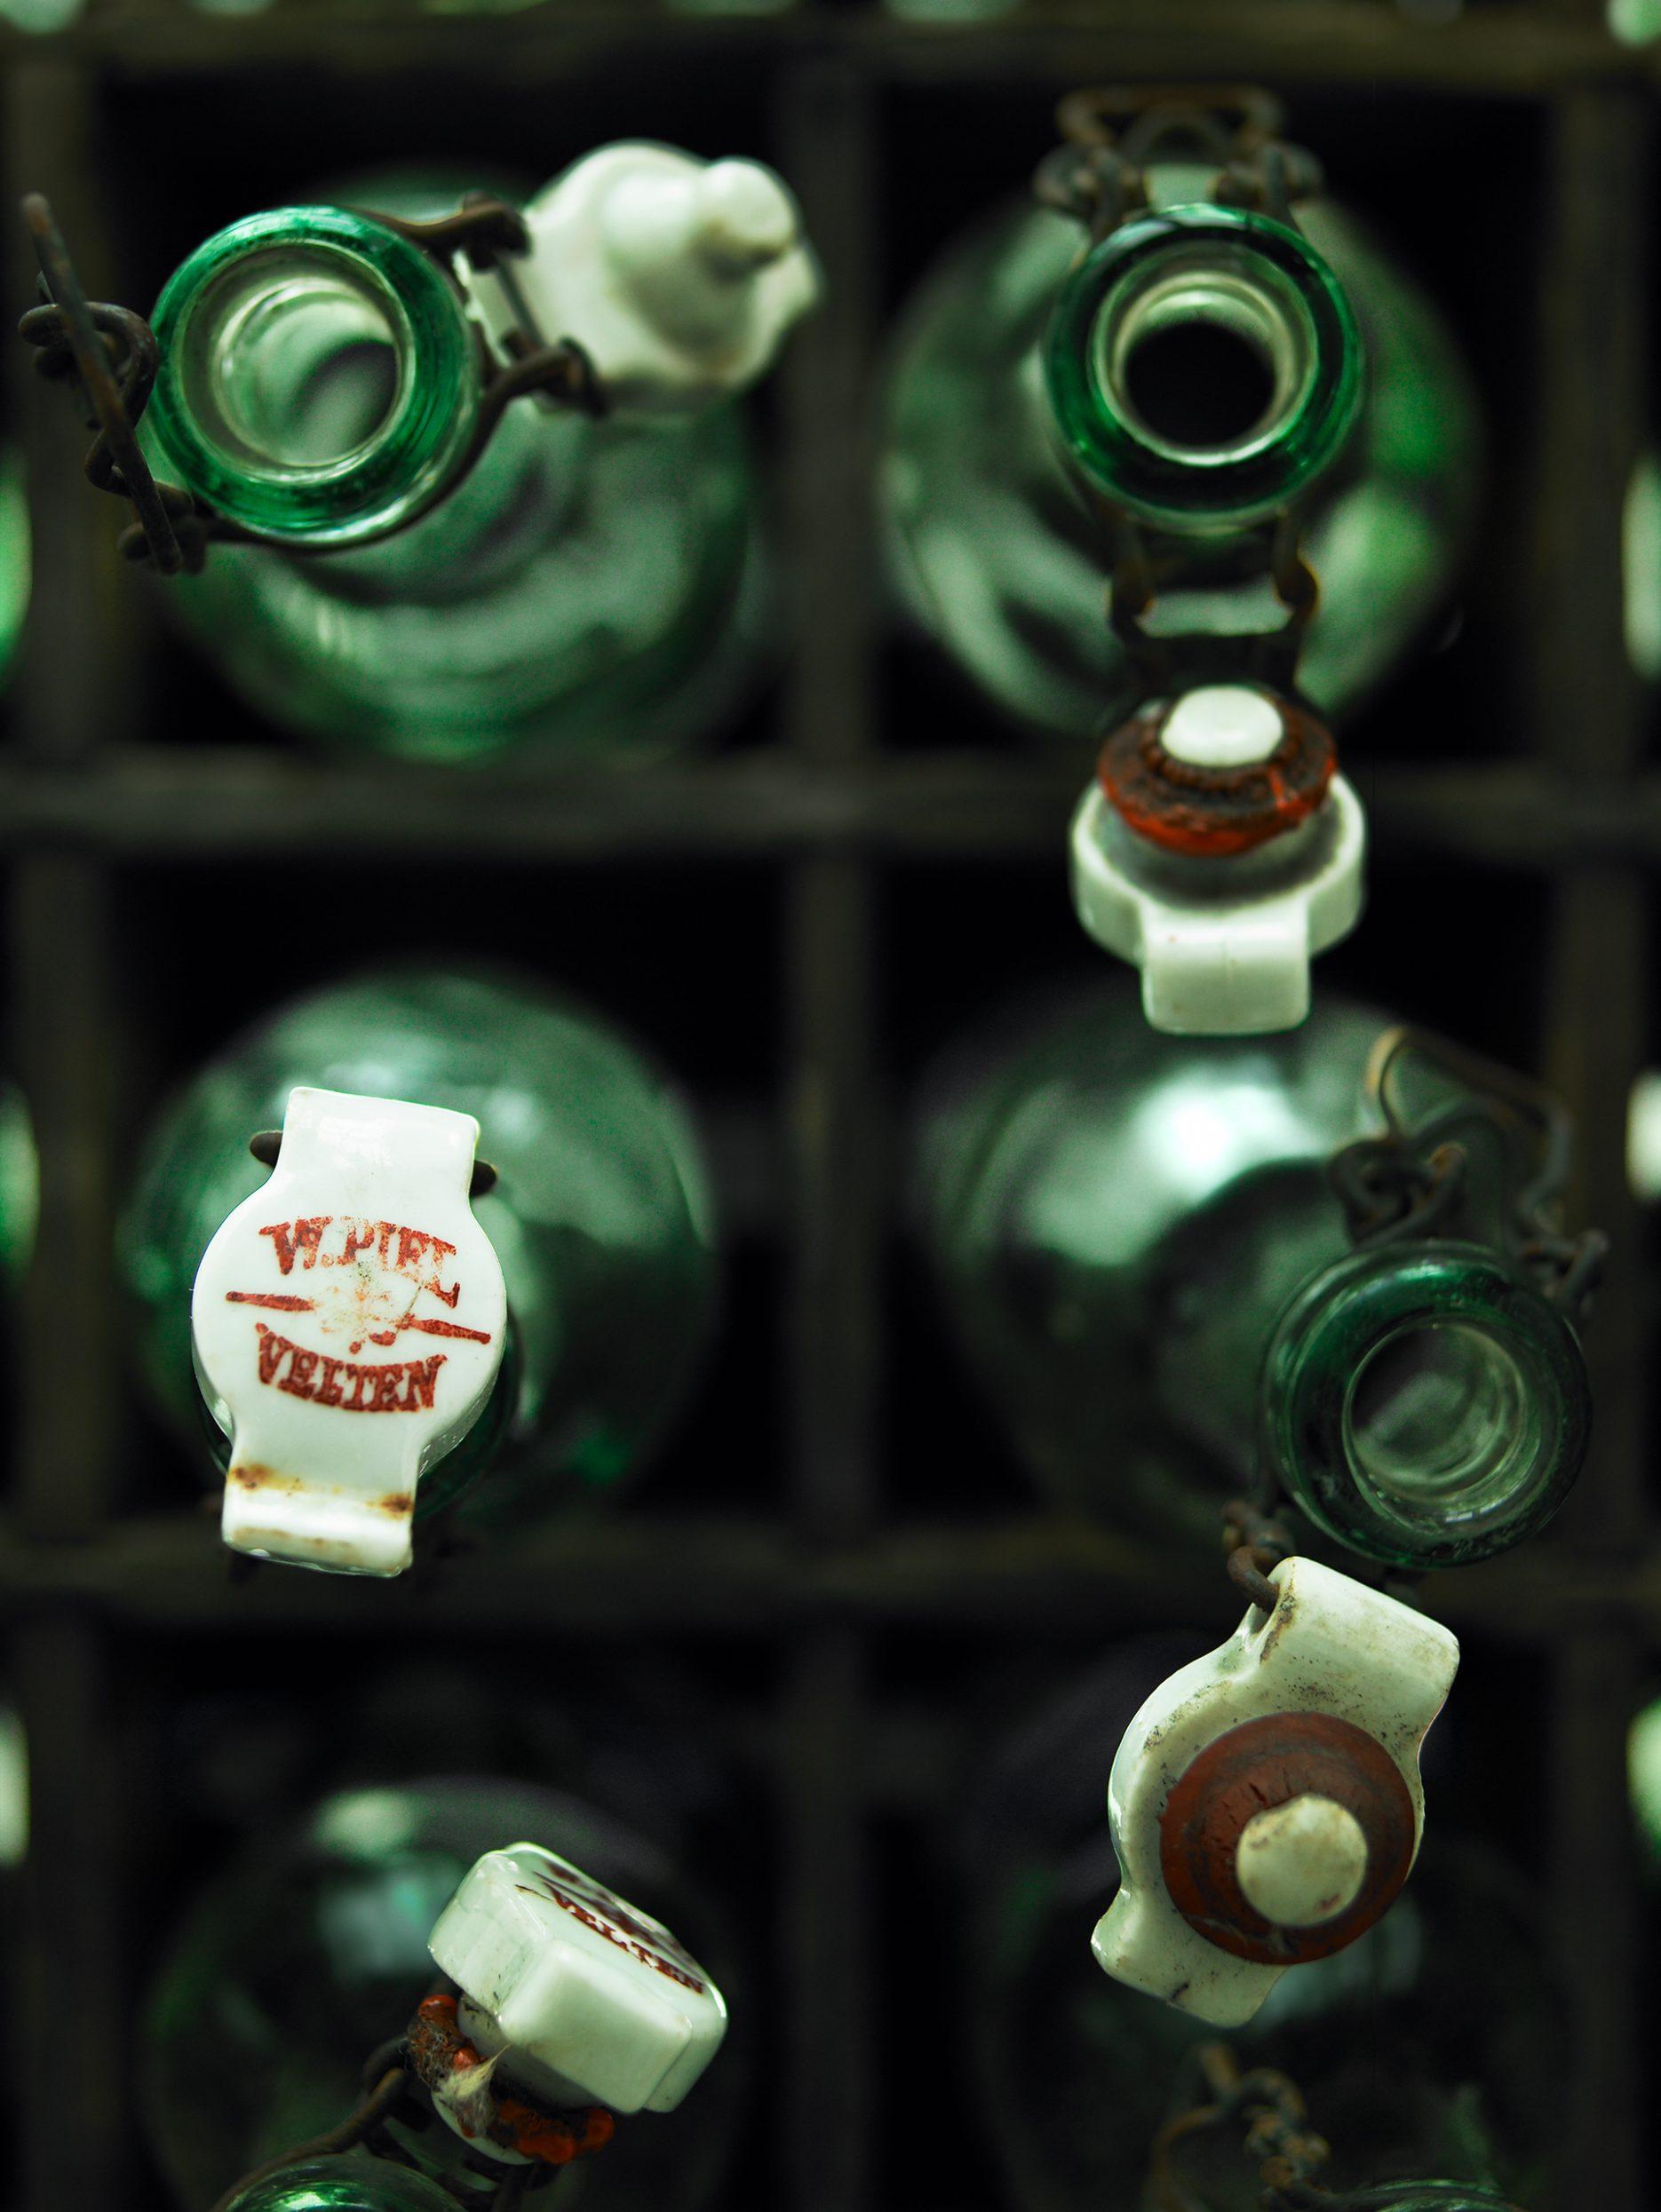 Bildbearbeitung Bierflaschen